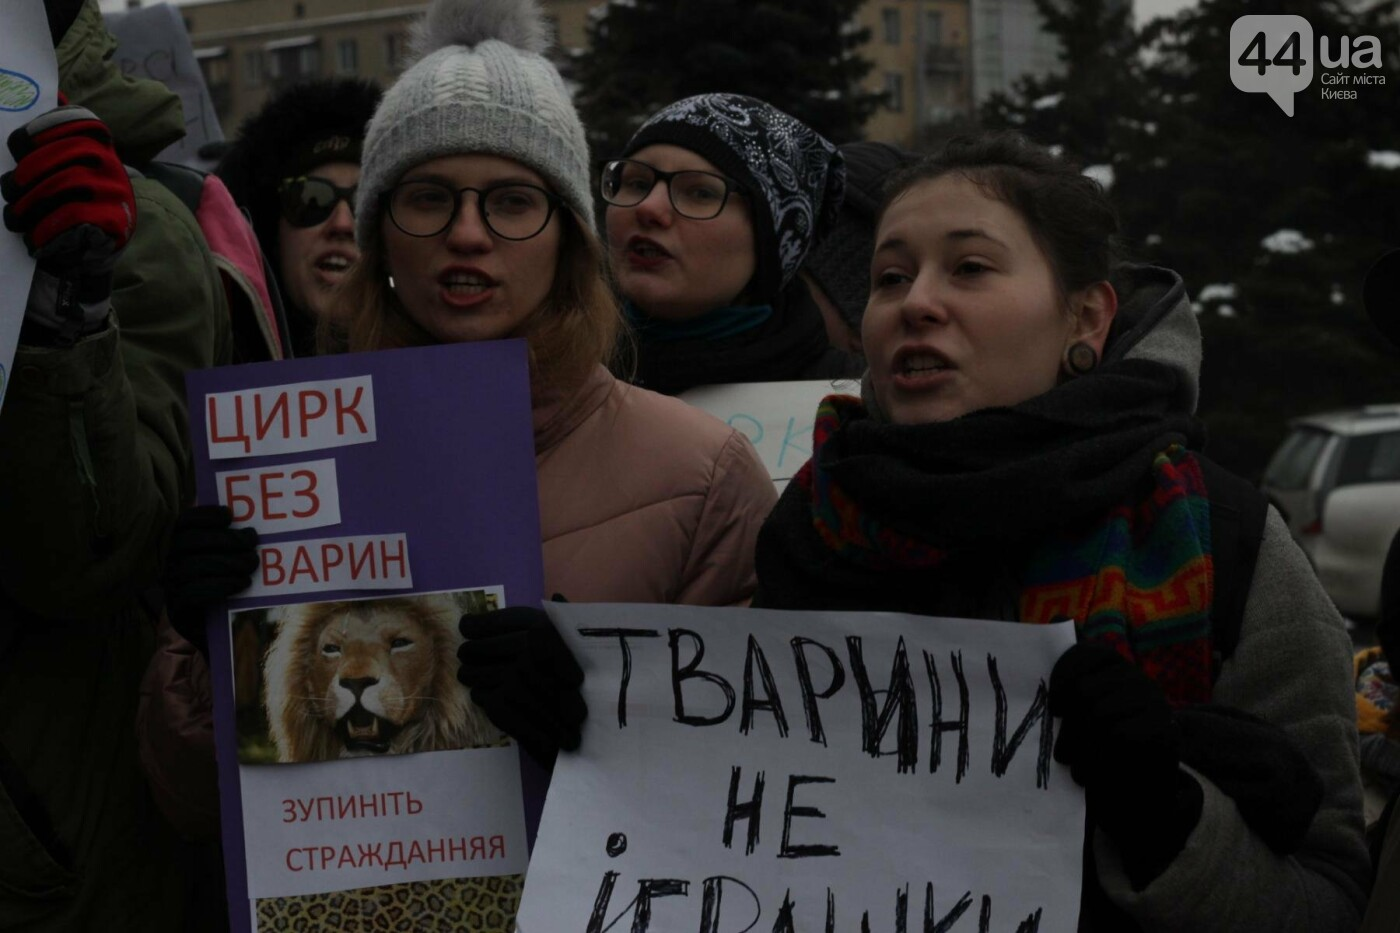 Цирк без животных: как в Киеве прошла акция протеста, фото-9